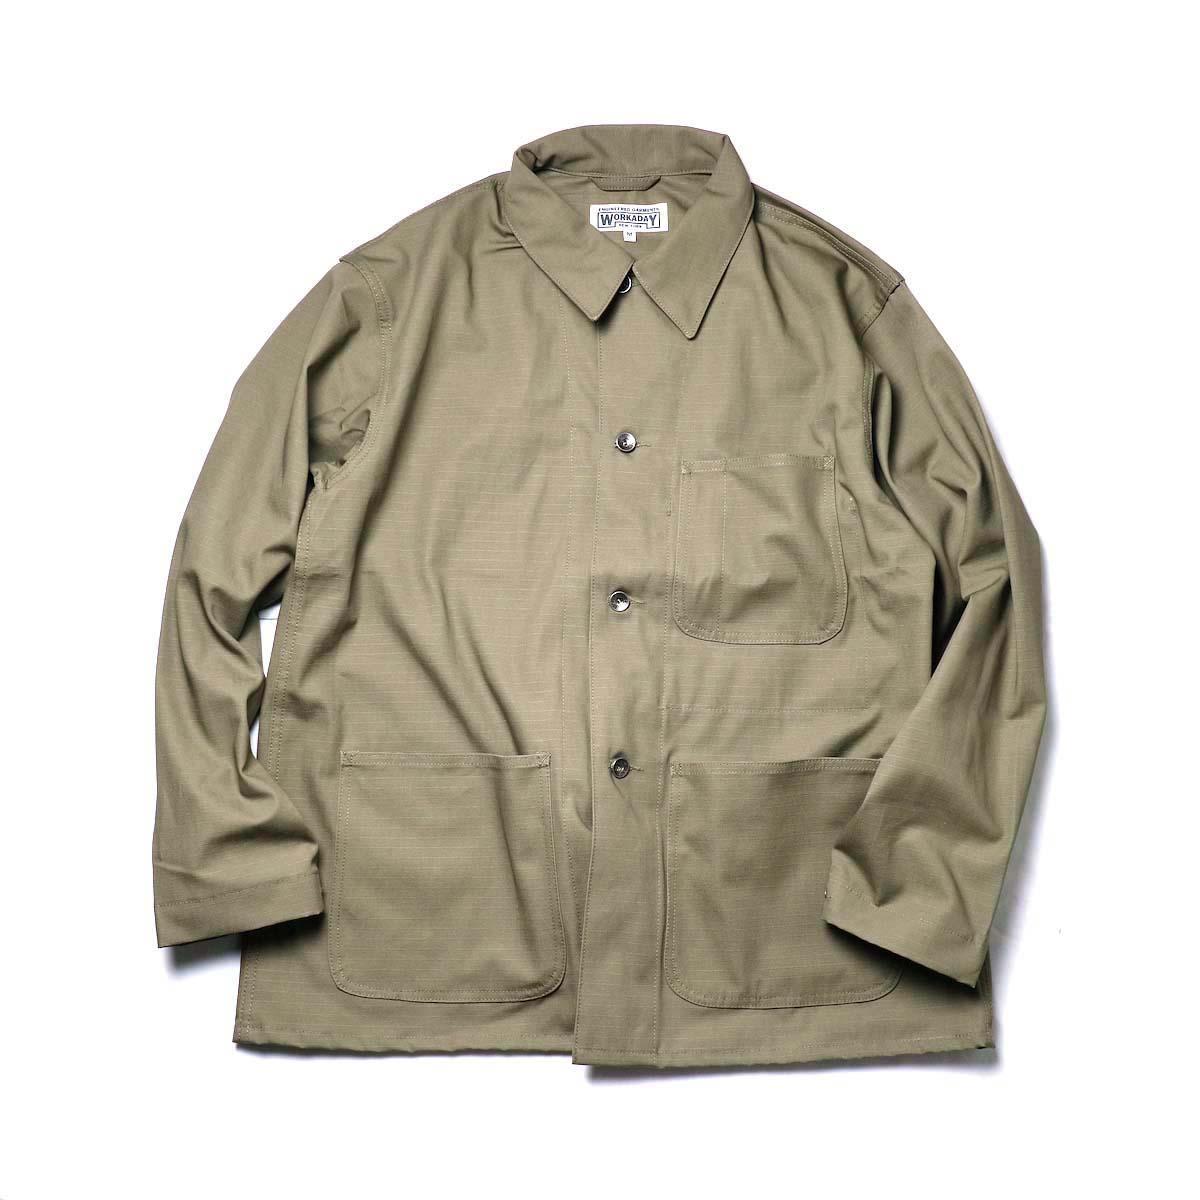 Engineered Garments Workaday / Utility Jacket - Cotton Ripstop (Khaki)